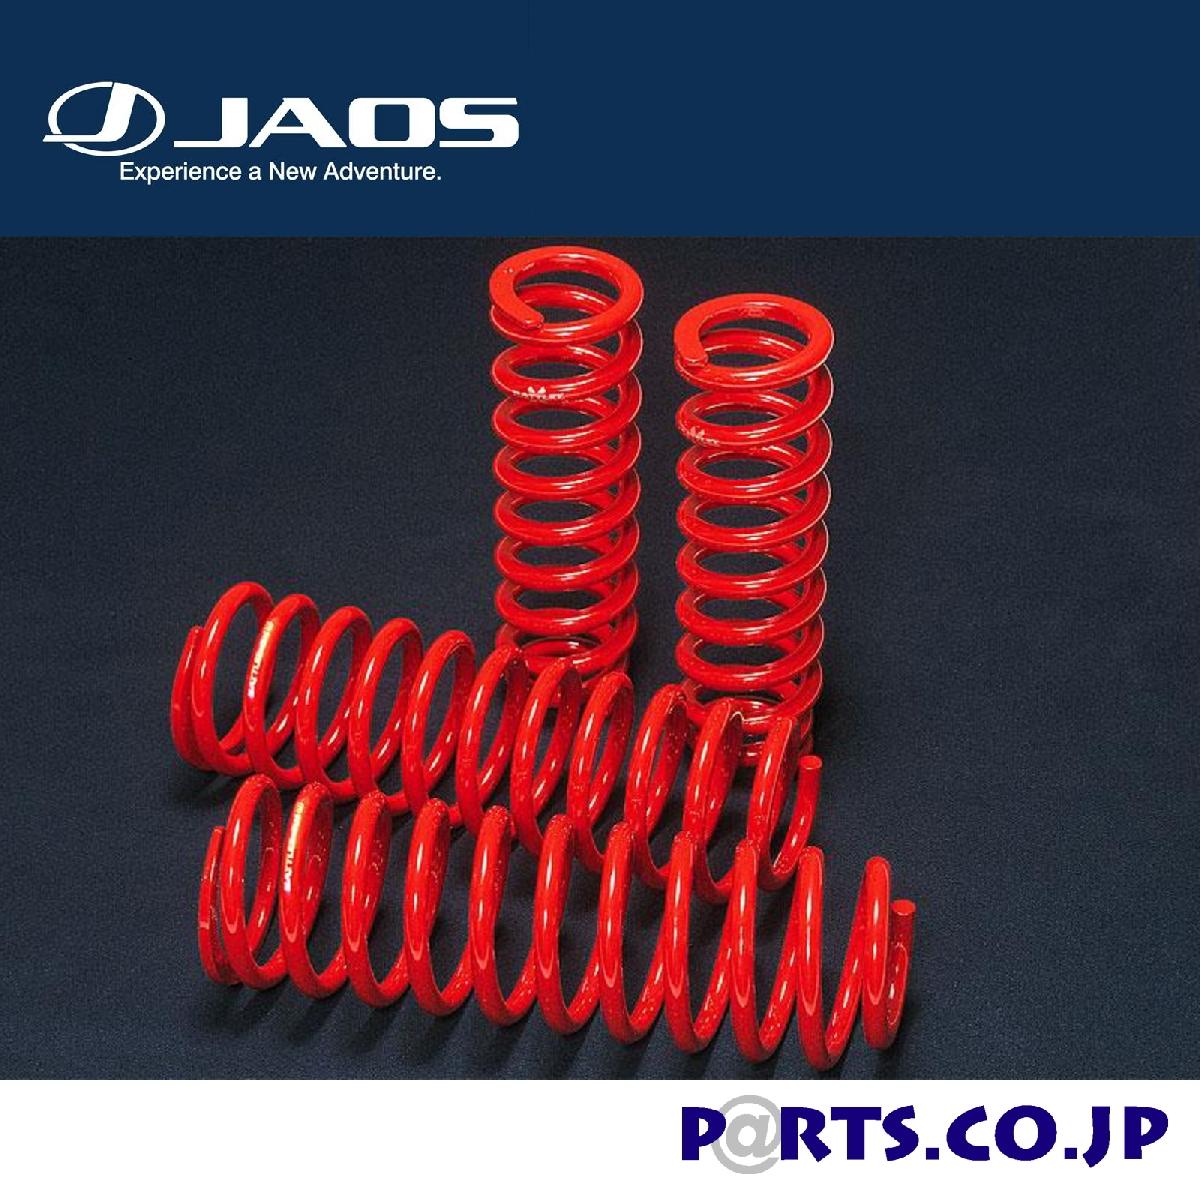 JAOS(ジャオス)トヨタハイラックスサーフスプリングBATTLEZUPCOILTiSET185SURF98-05GASOLINE